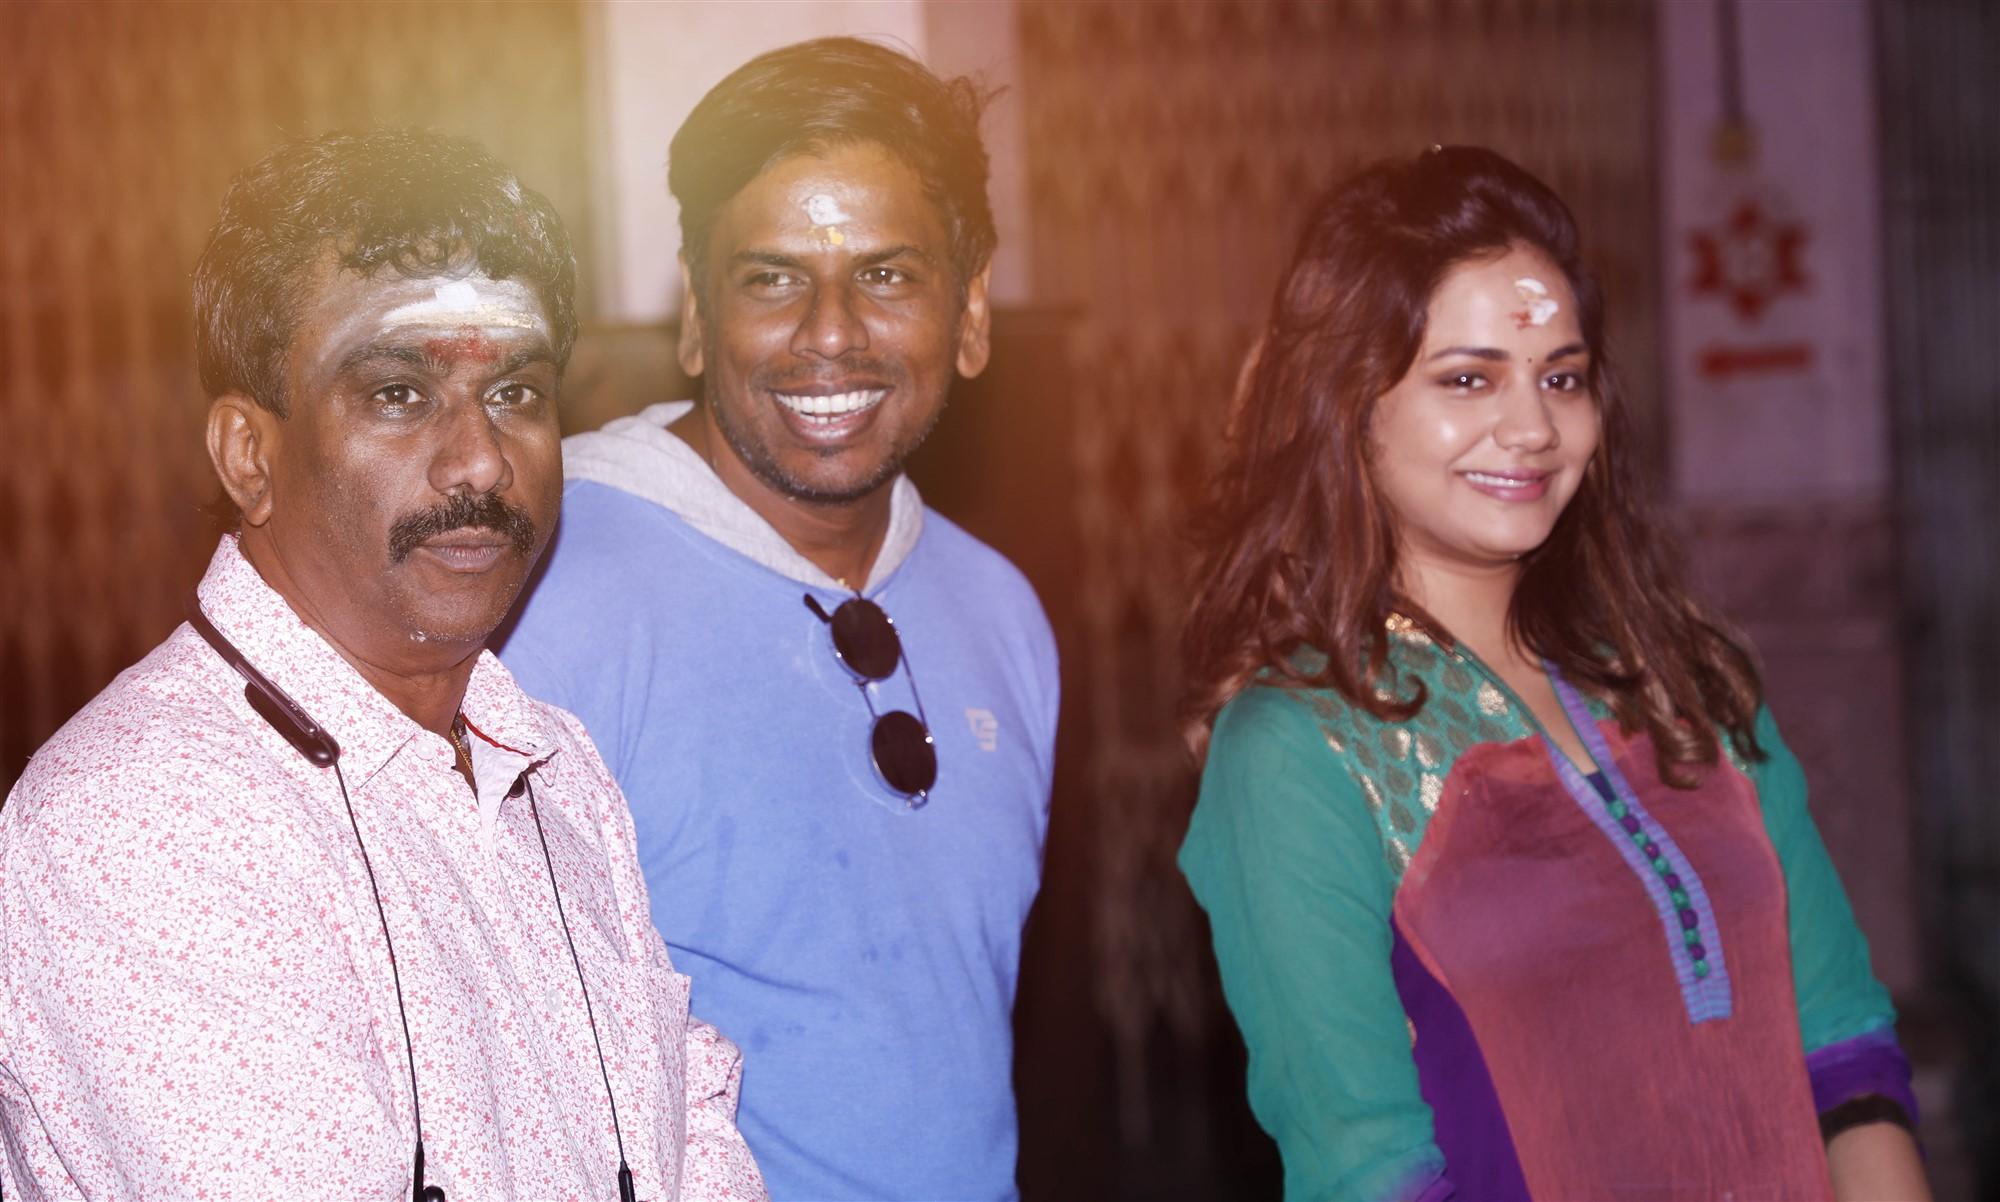 Nikhil Murgan, Vijay Sri G, Aishwarya Dutta @ Polladha Ulagil Bayangara Game (PubG) Movie Pooja Stills